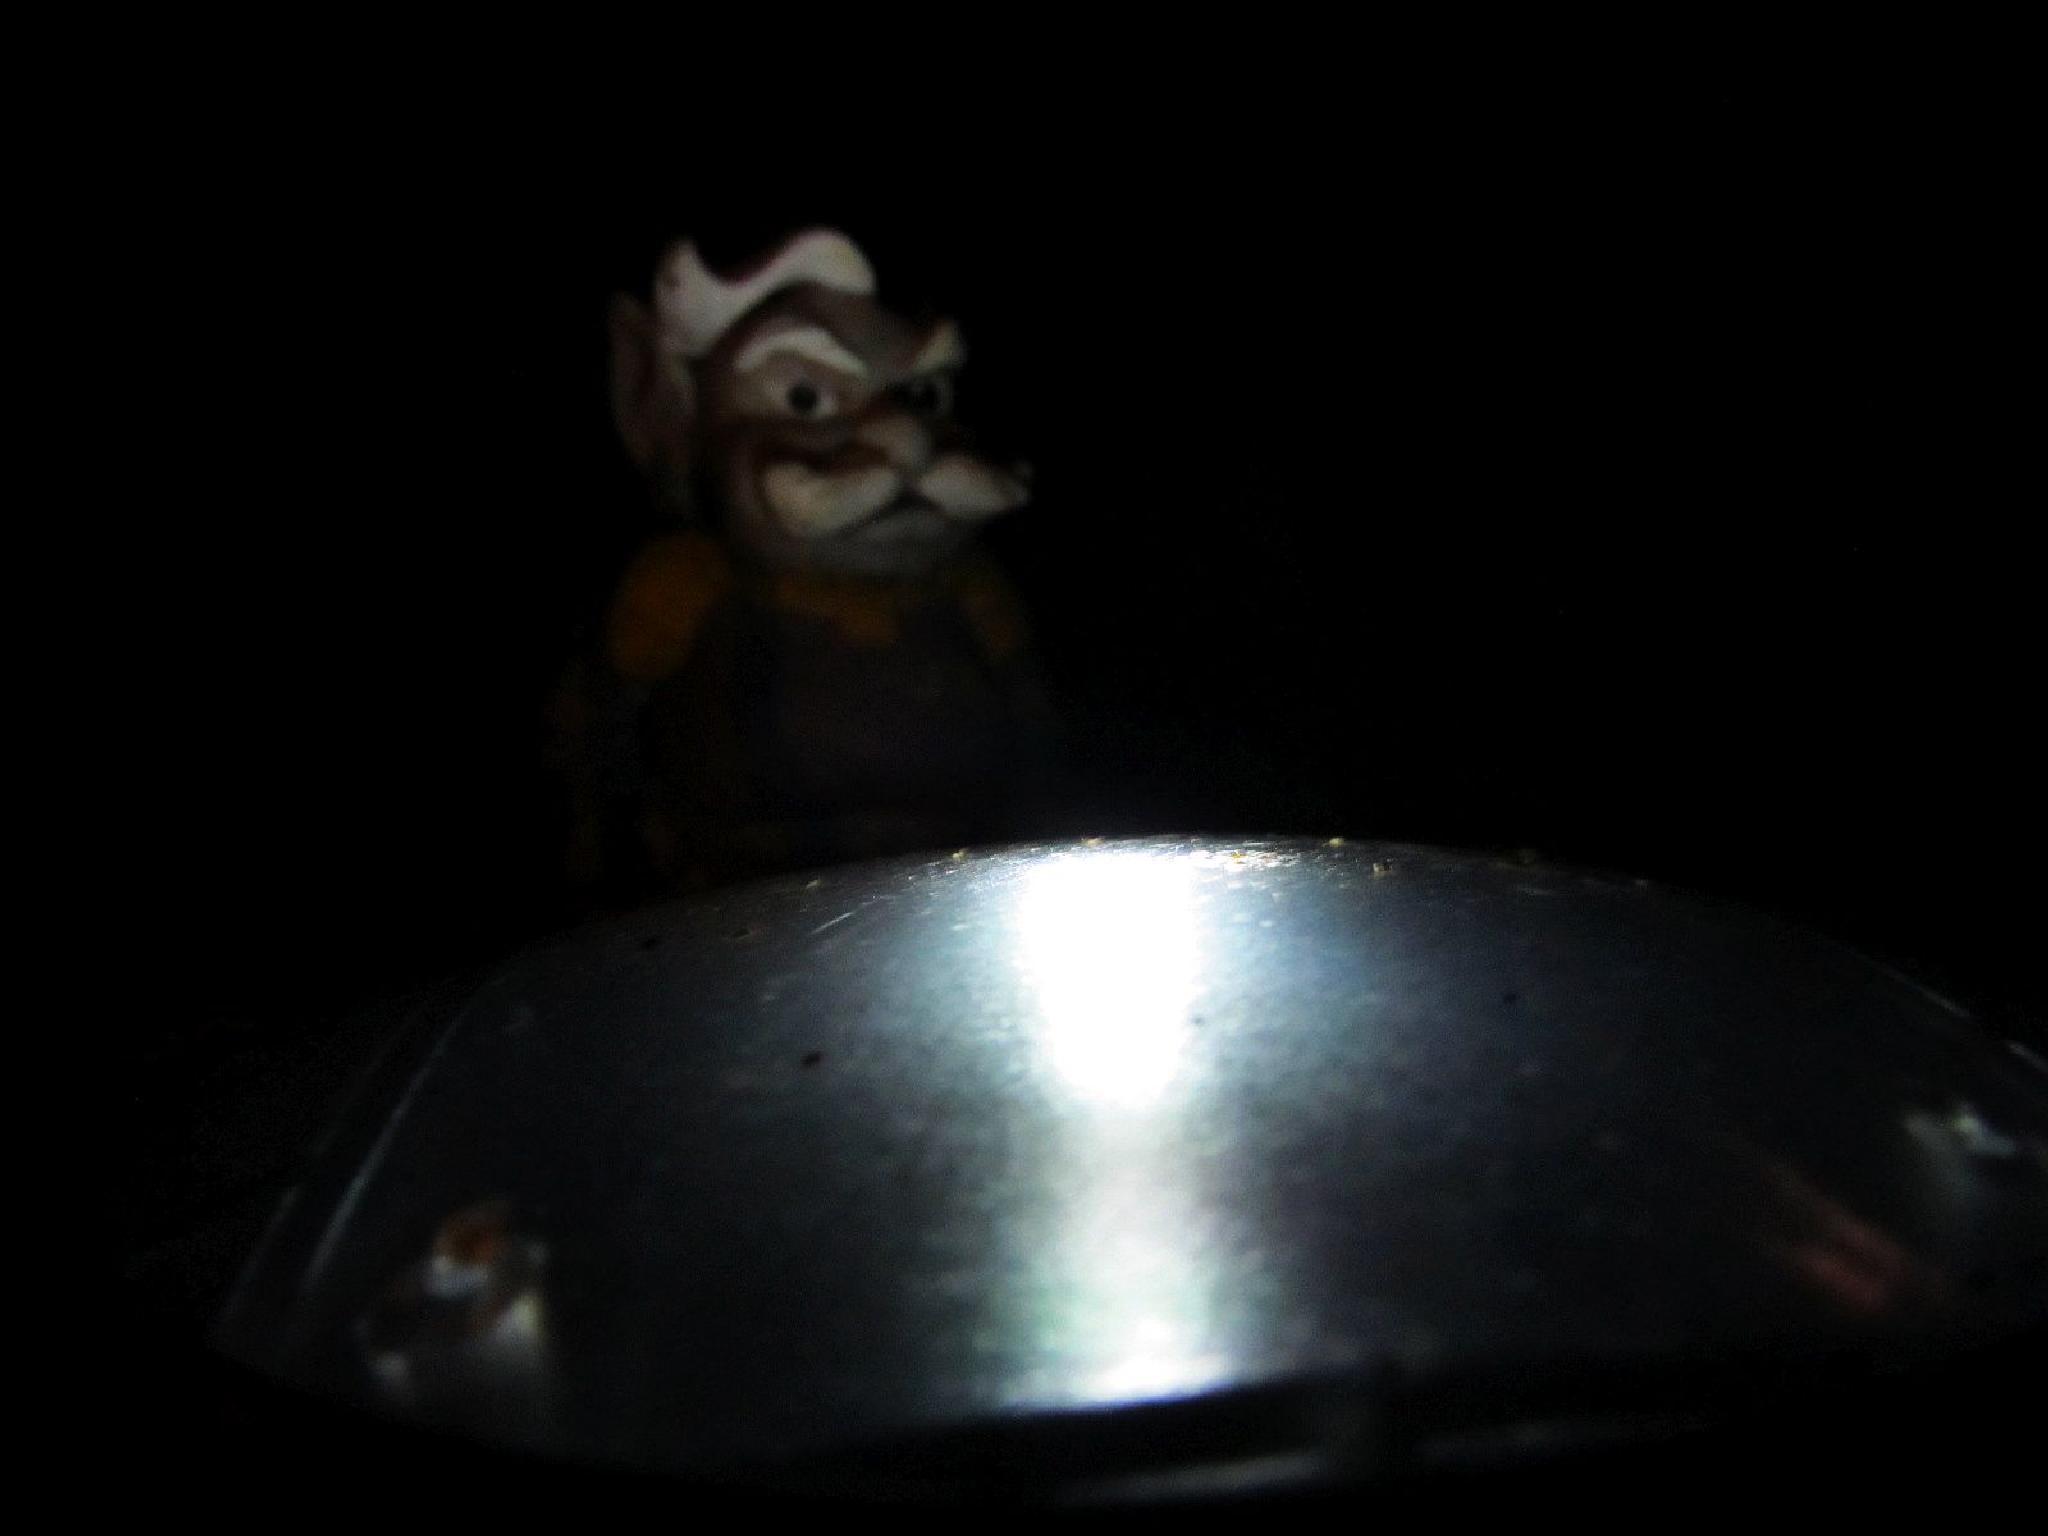 Night watchman still on duty by Ruth Moore